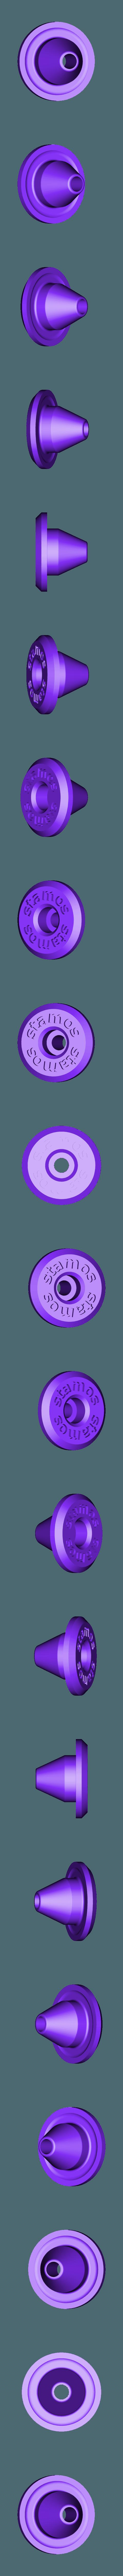 Plug_stamos_28mm.stl Download free STL file Bar-End bike Plugs • Object to 3D print, Stamos